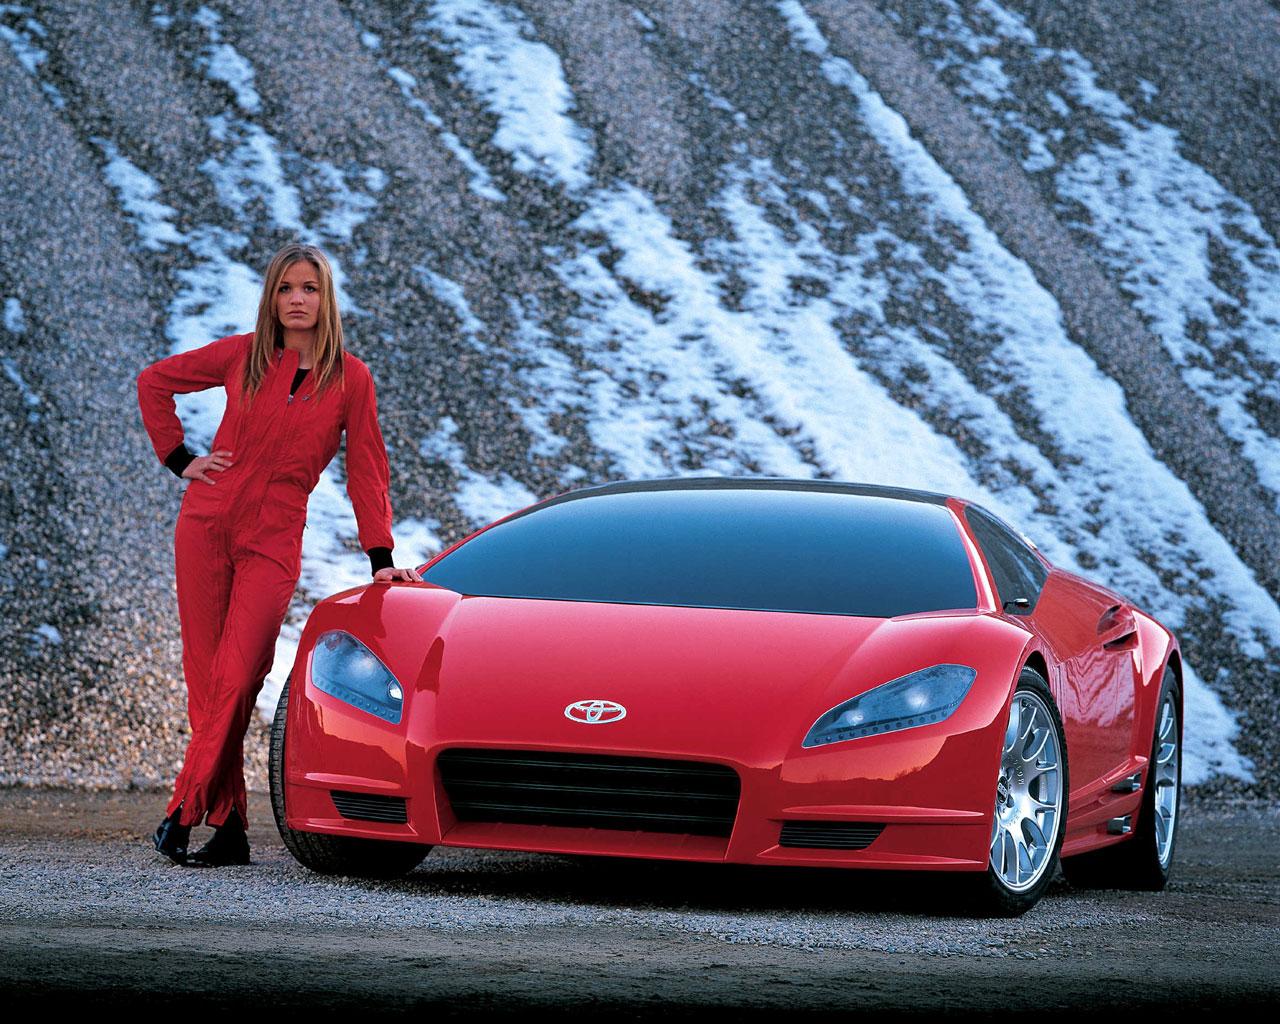 cars exotic supercars wallpaper - photo #20